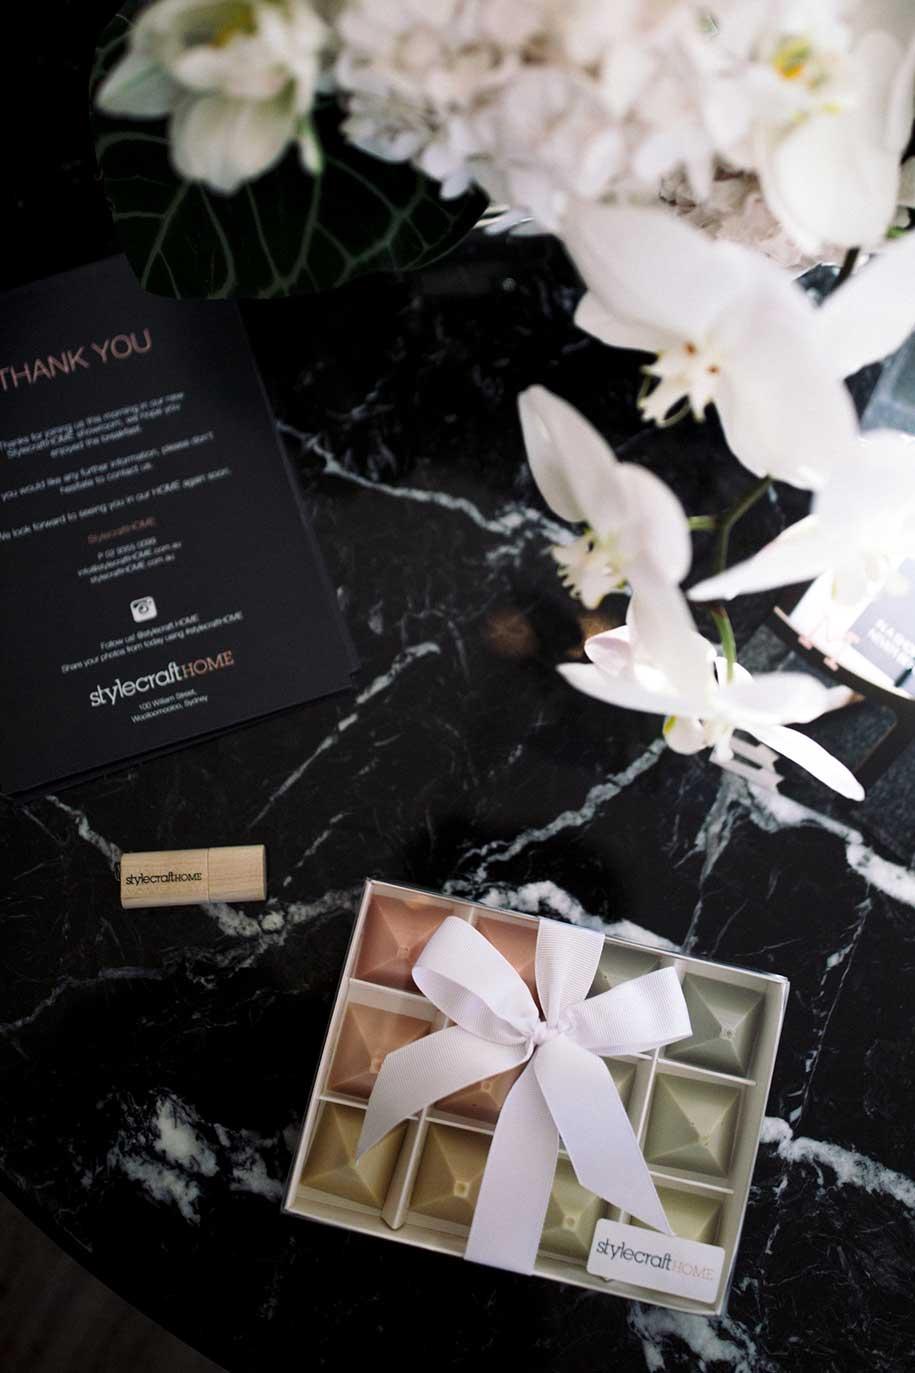 StylecraftHOME | Habitus Living